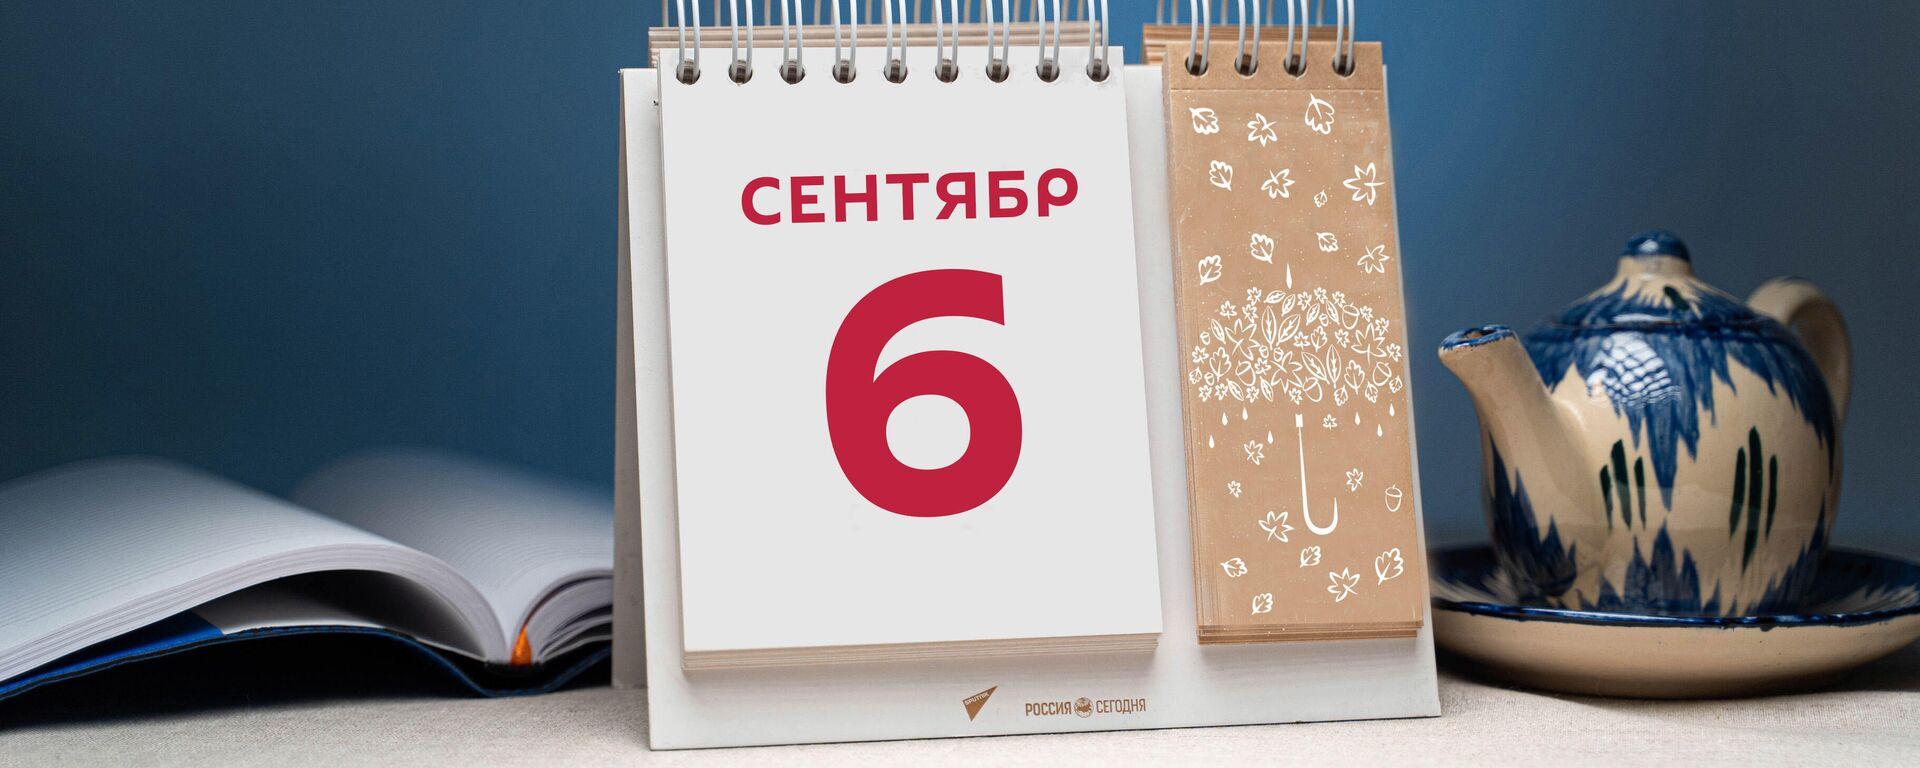 День 6 сентября - Sputnik Тоҷикистон, 1920, 06.09.2021